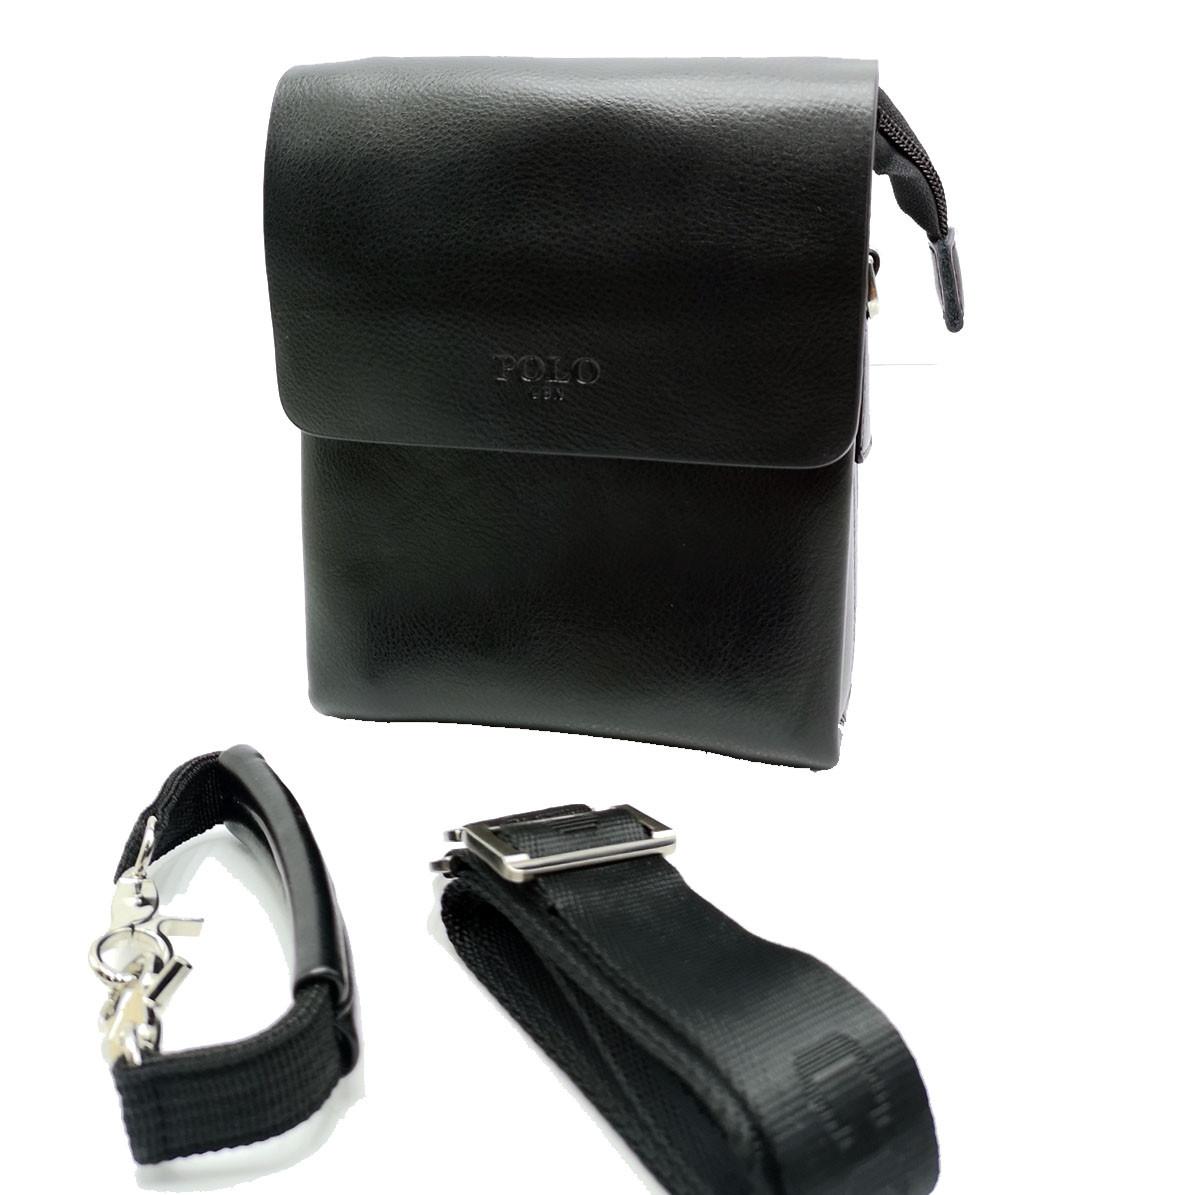 Мужская сумка Polo клапан кожа (B375-1)